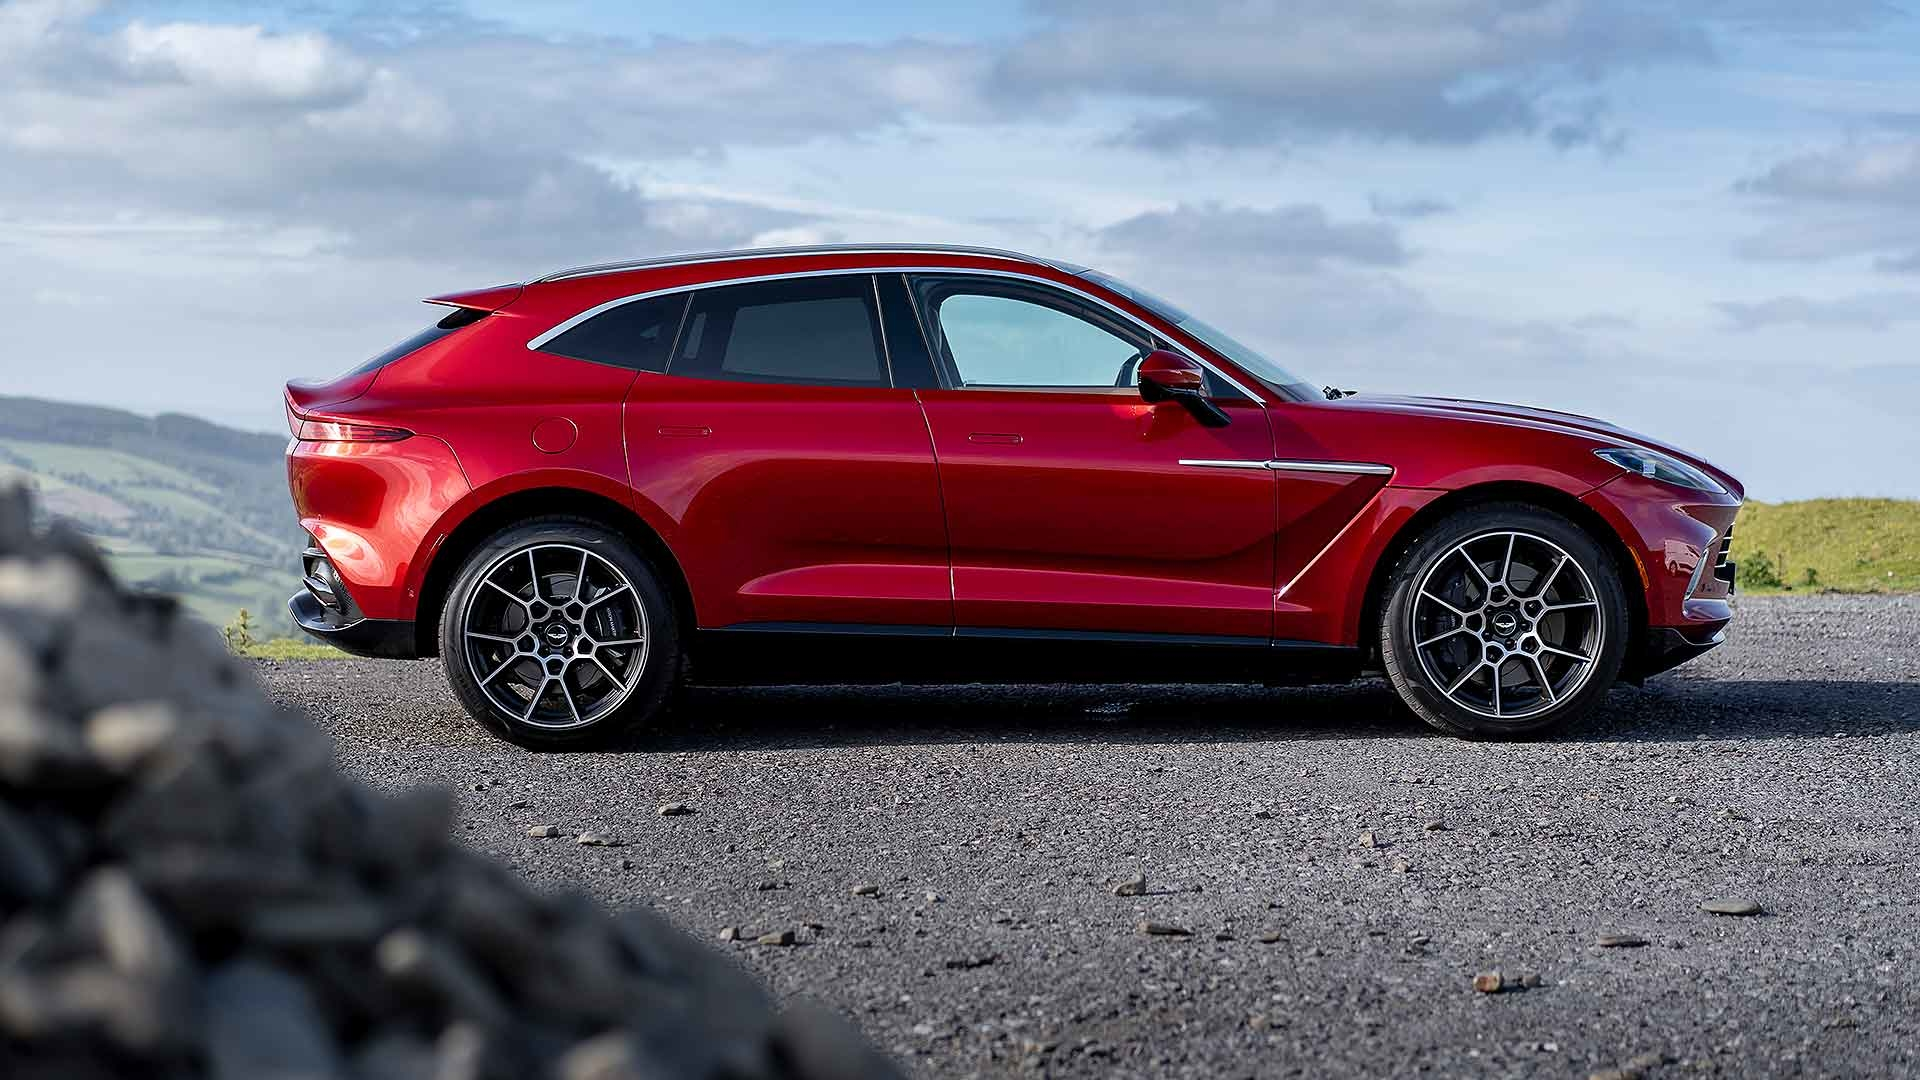 Aston Martin Dbx 2020 Review Motoring Research